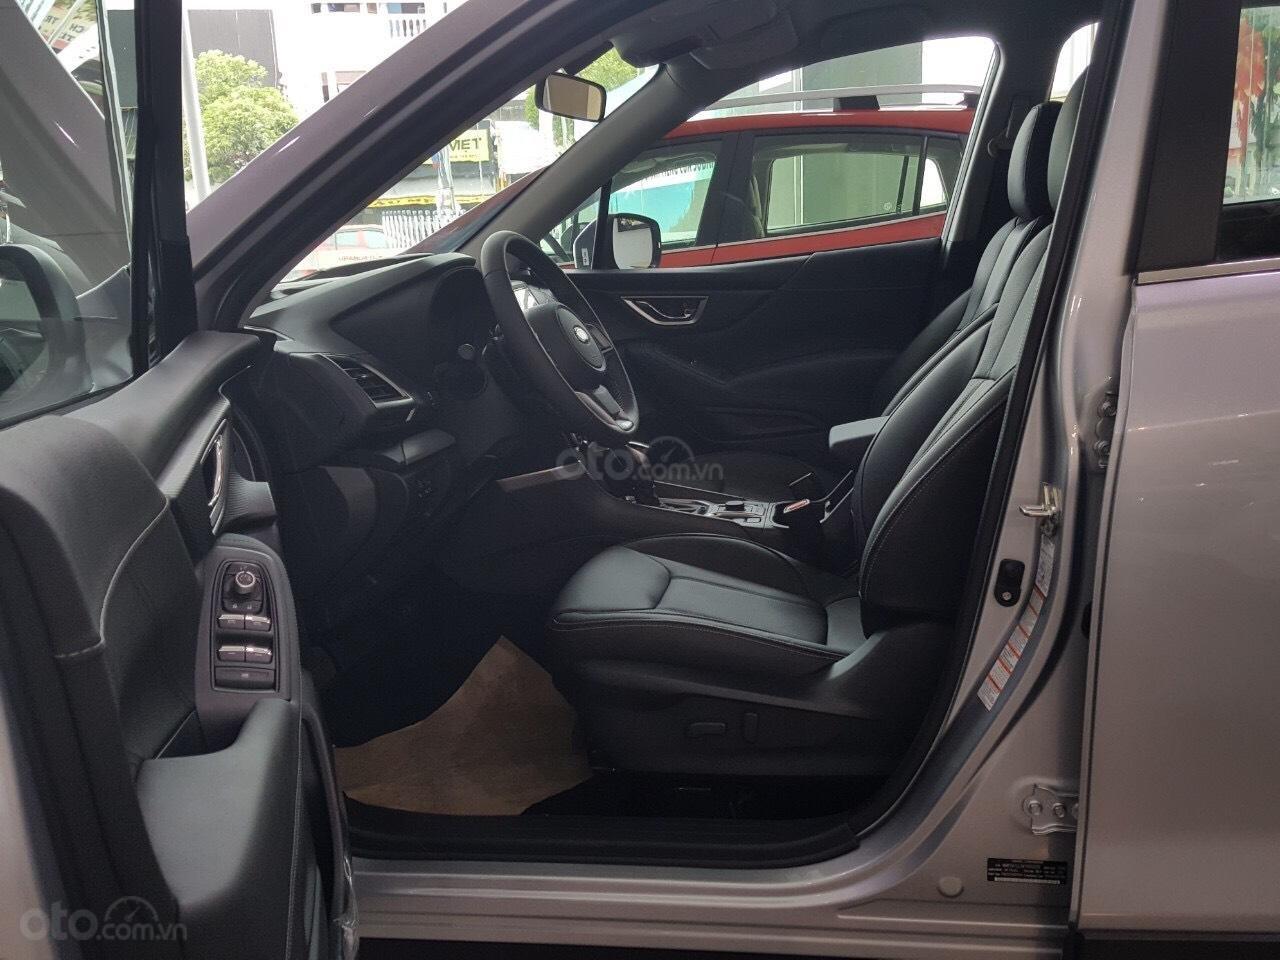 Bán Subaru Forester 2.0 IL, giảm TM trên 100tr, gọi 093.22222.30 Ms Loan (4)